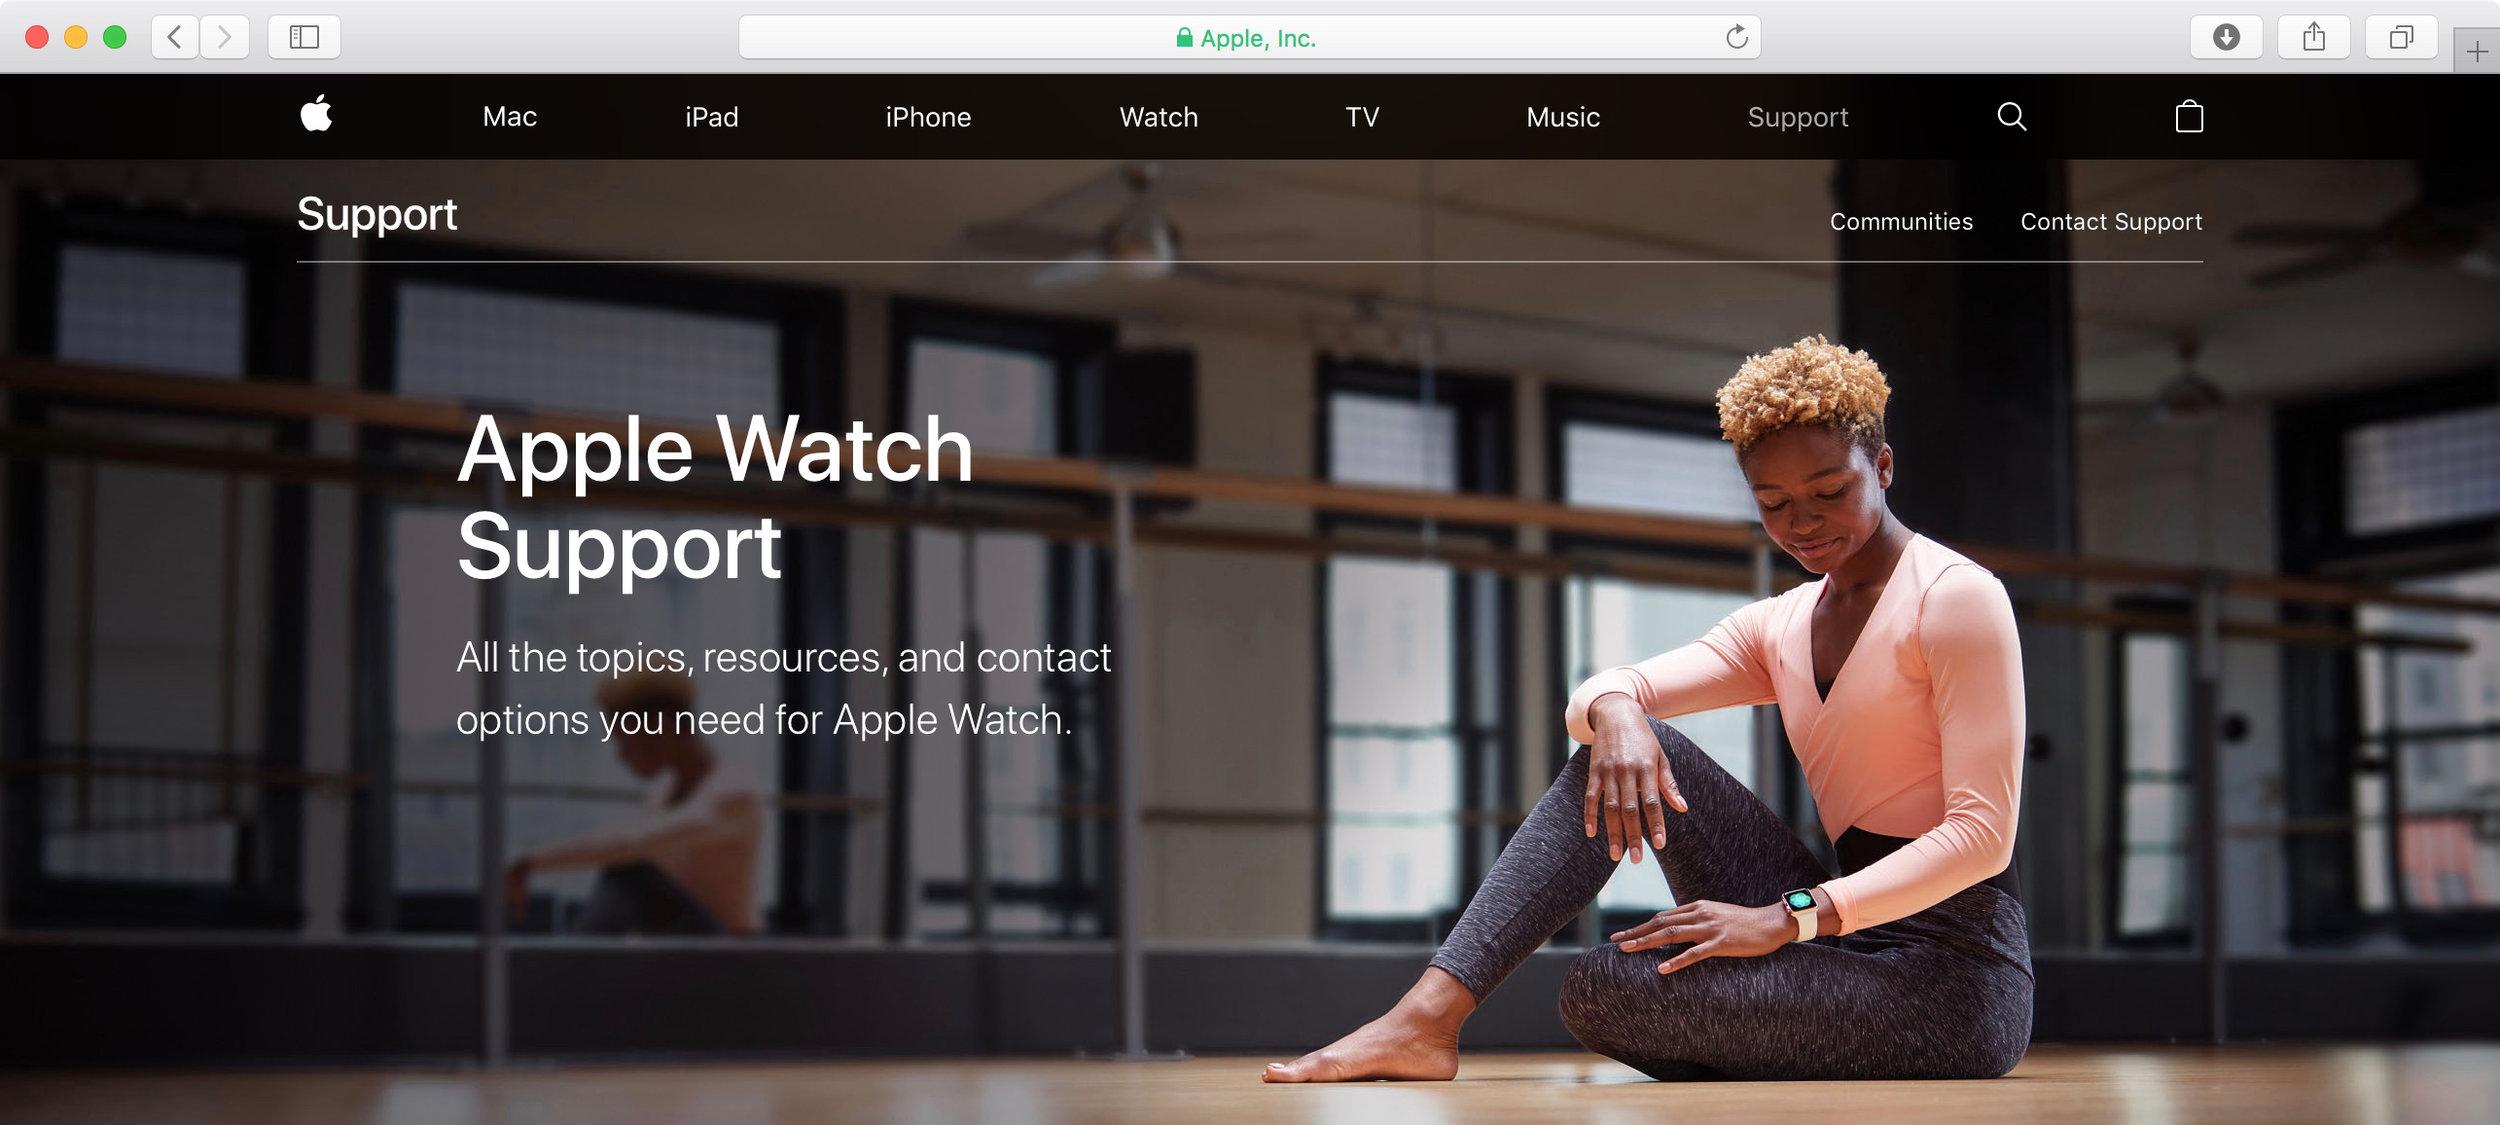 AppleWatch.jpeg